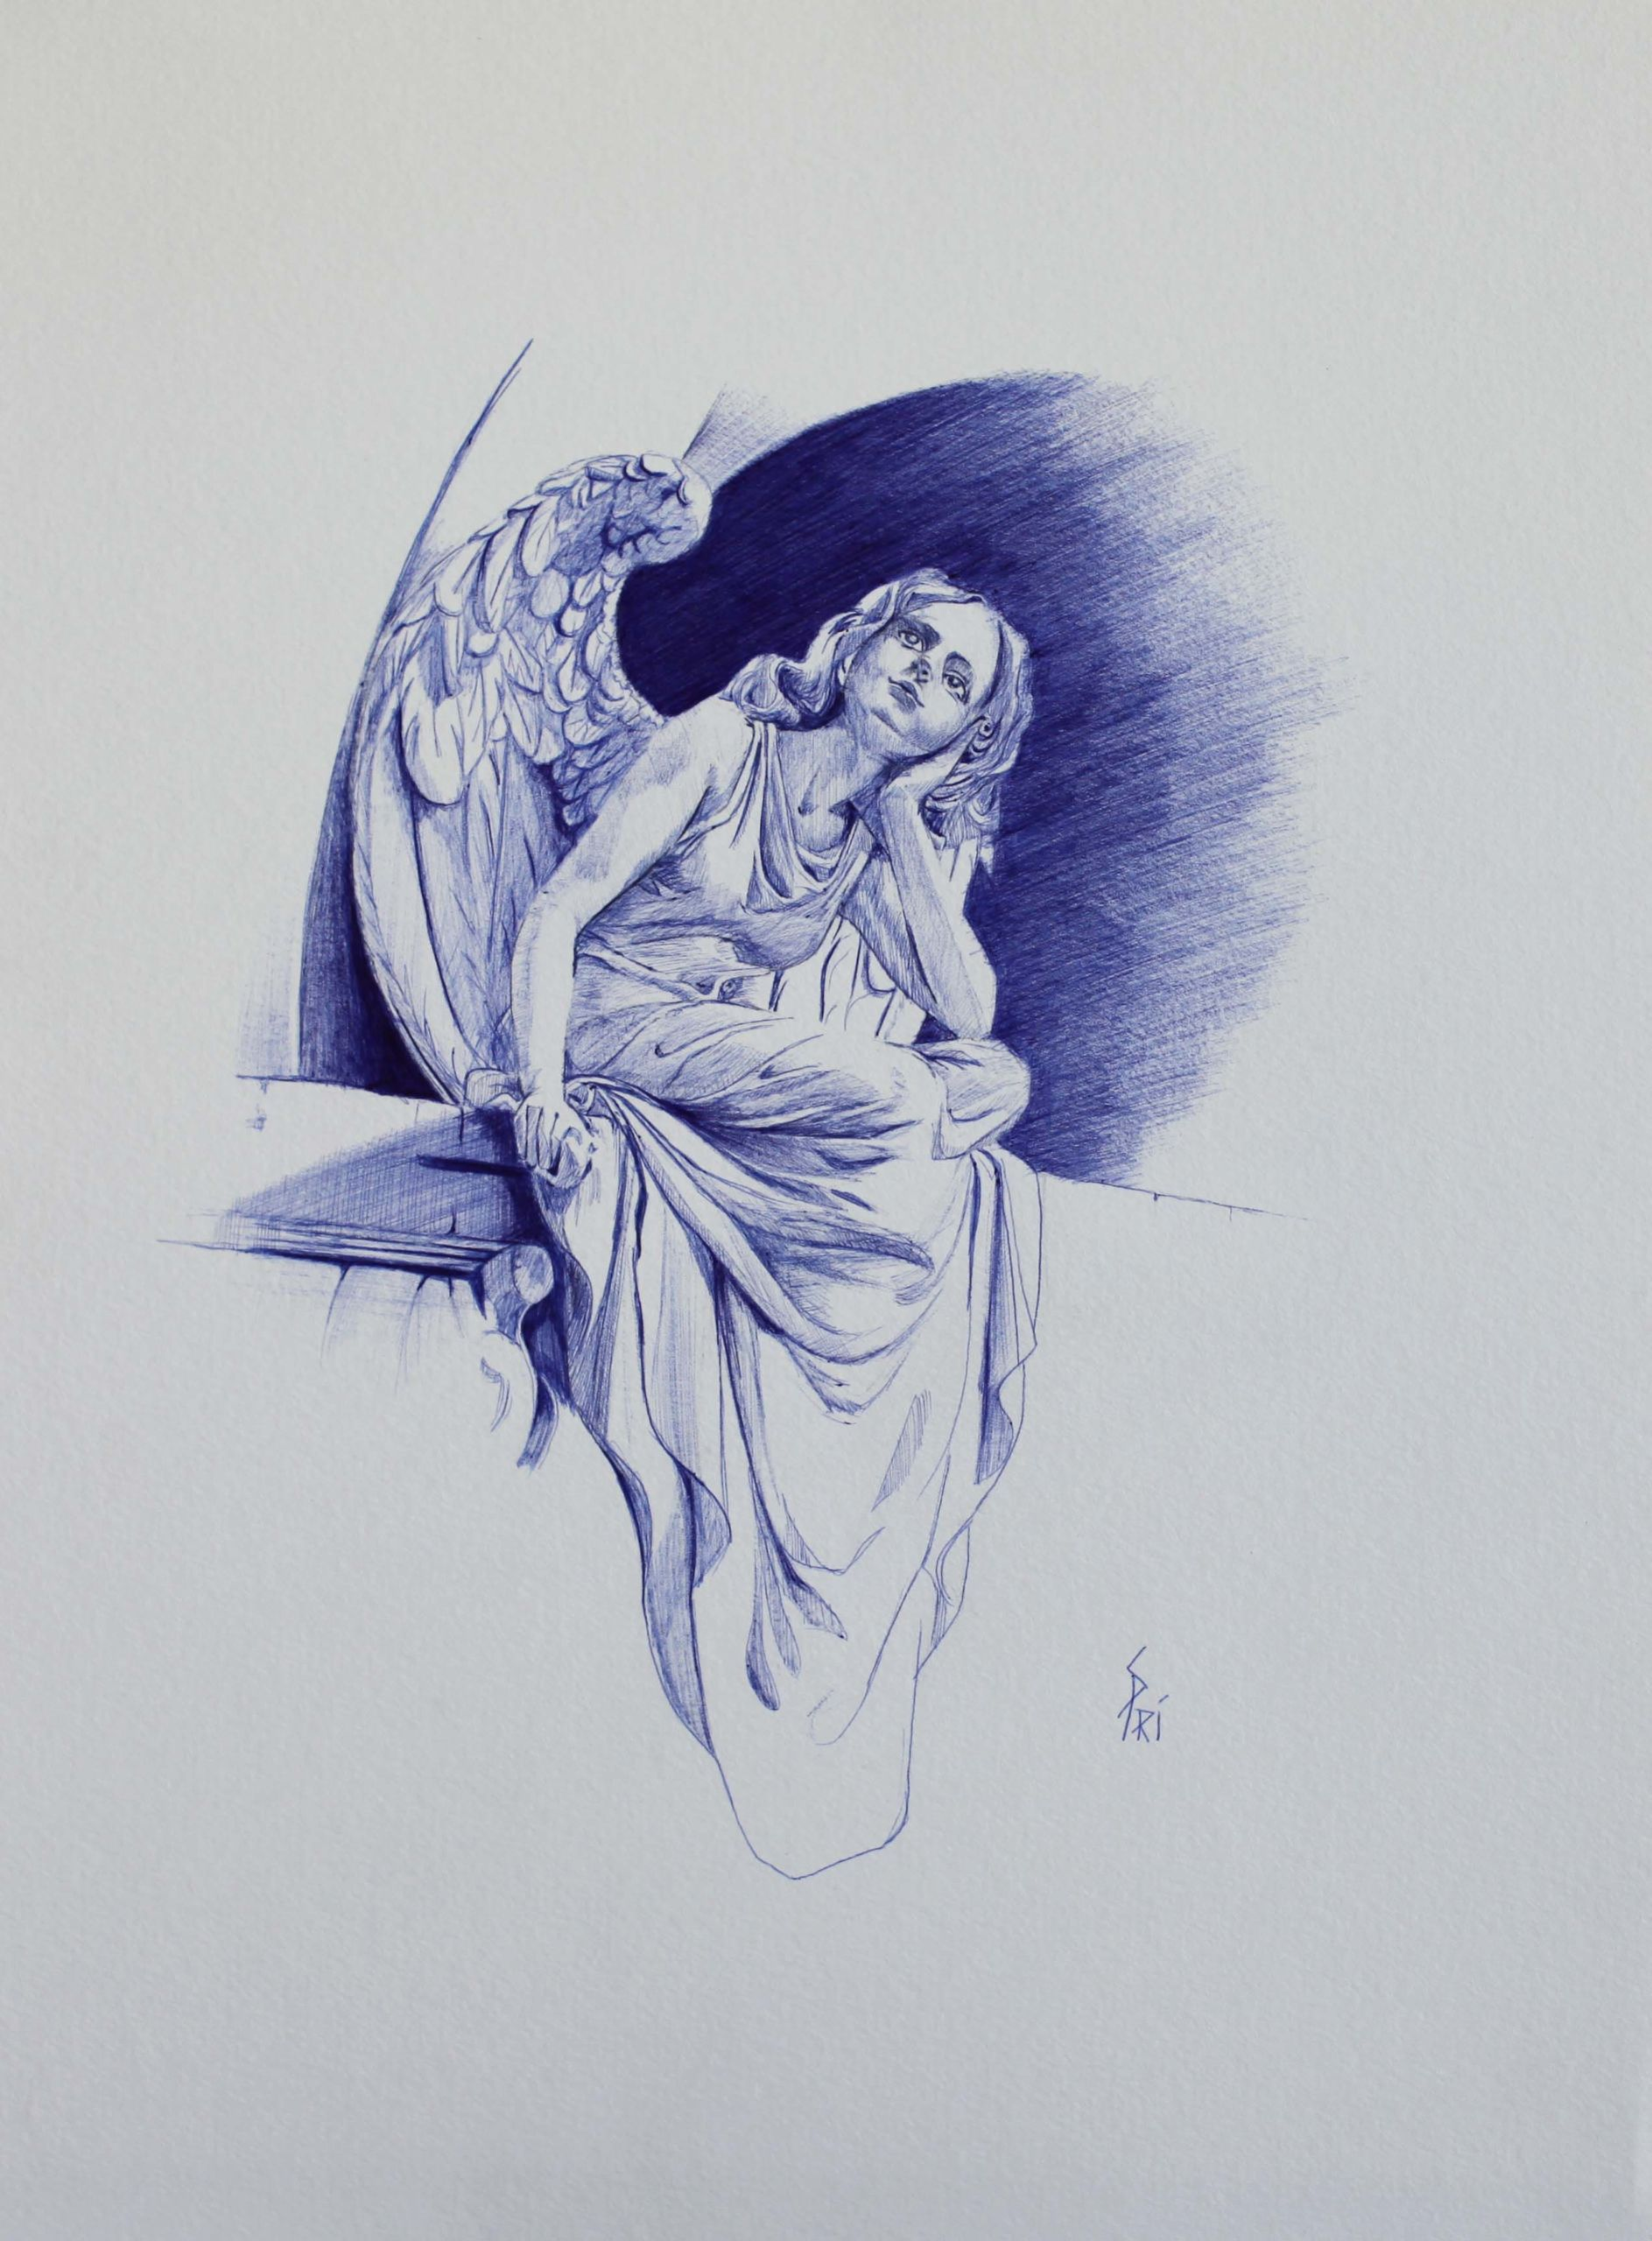 Dessin au stylo Bic par Priscilla Seiller-Mandereau, artiste-peintre